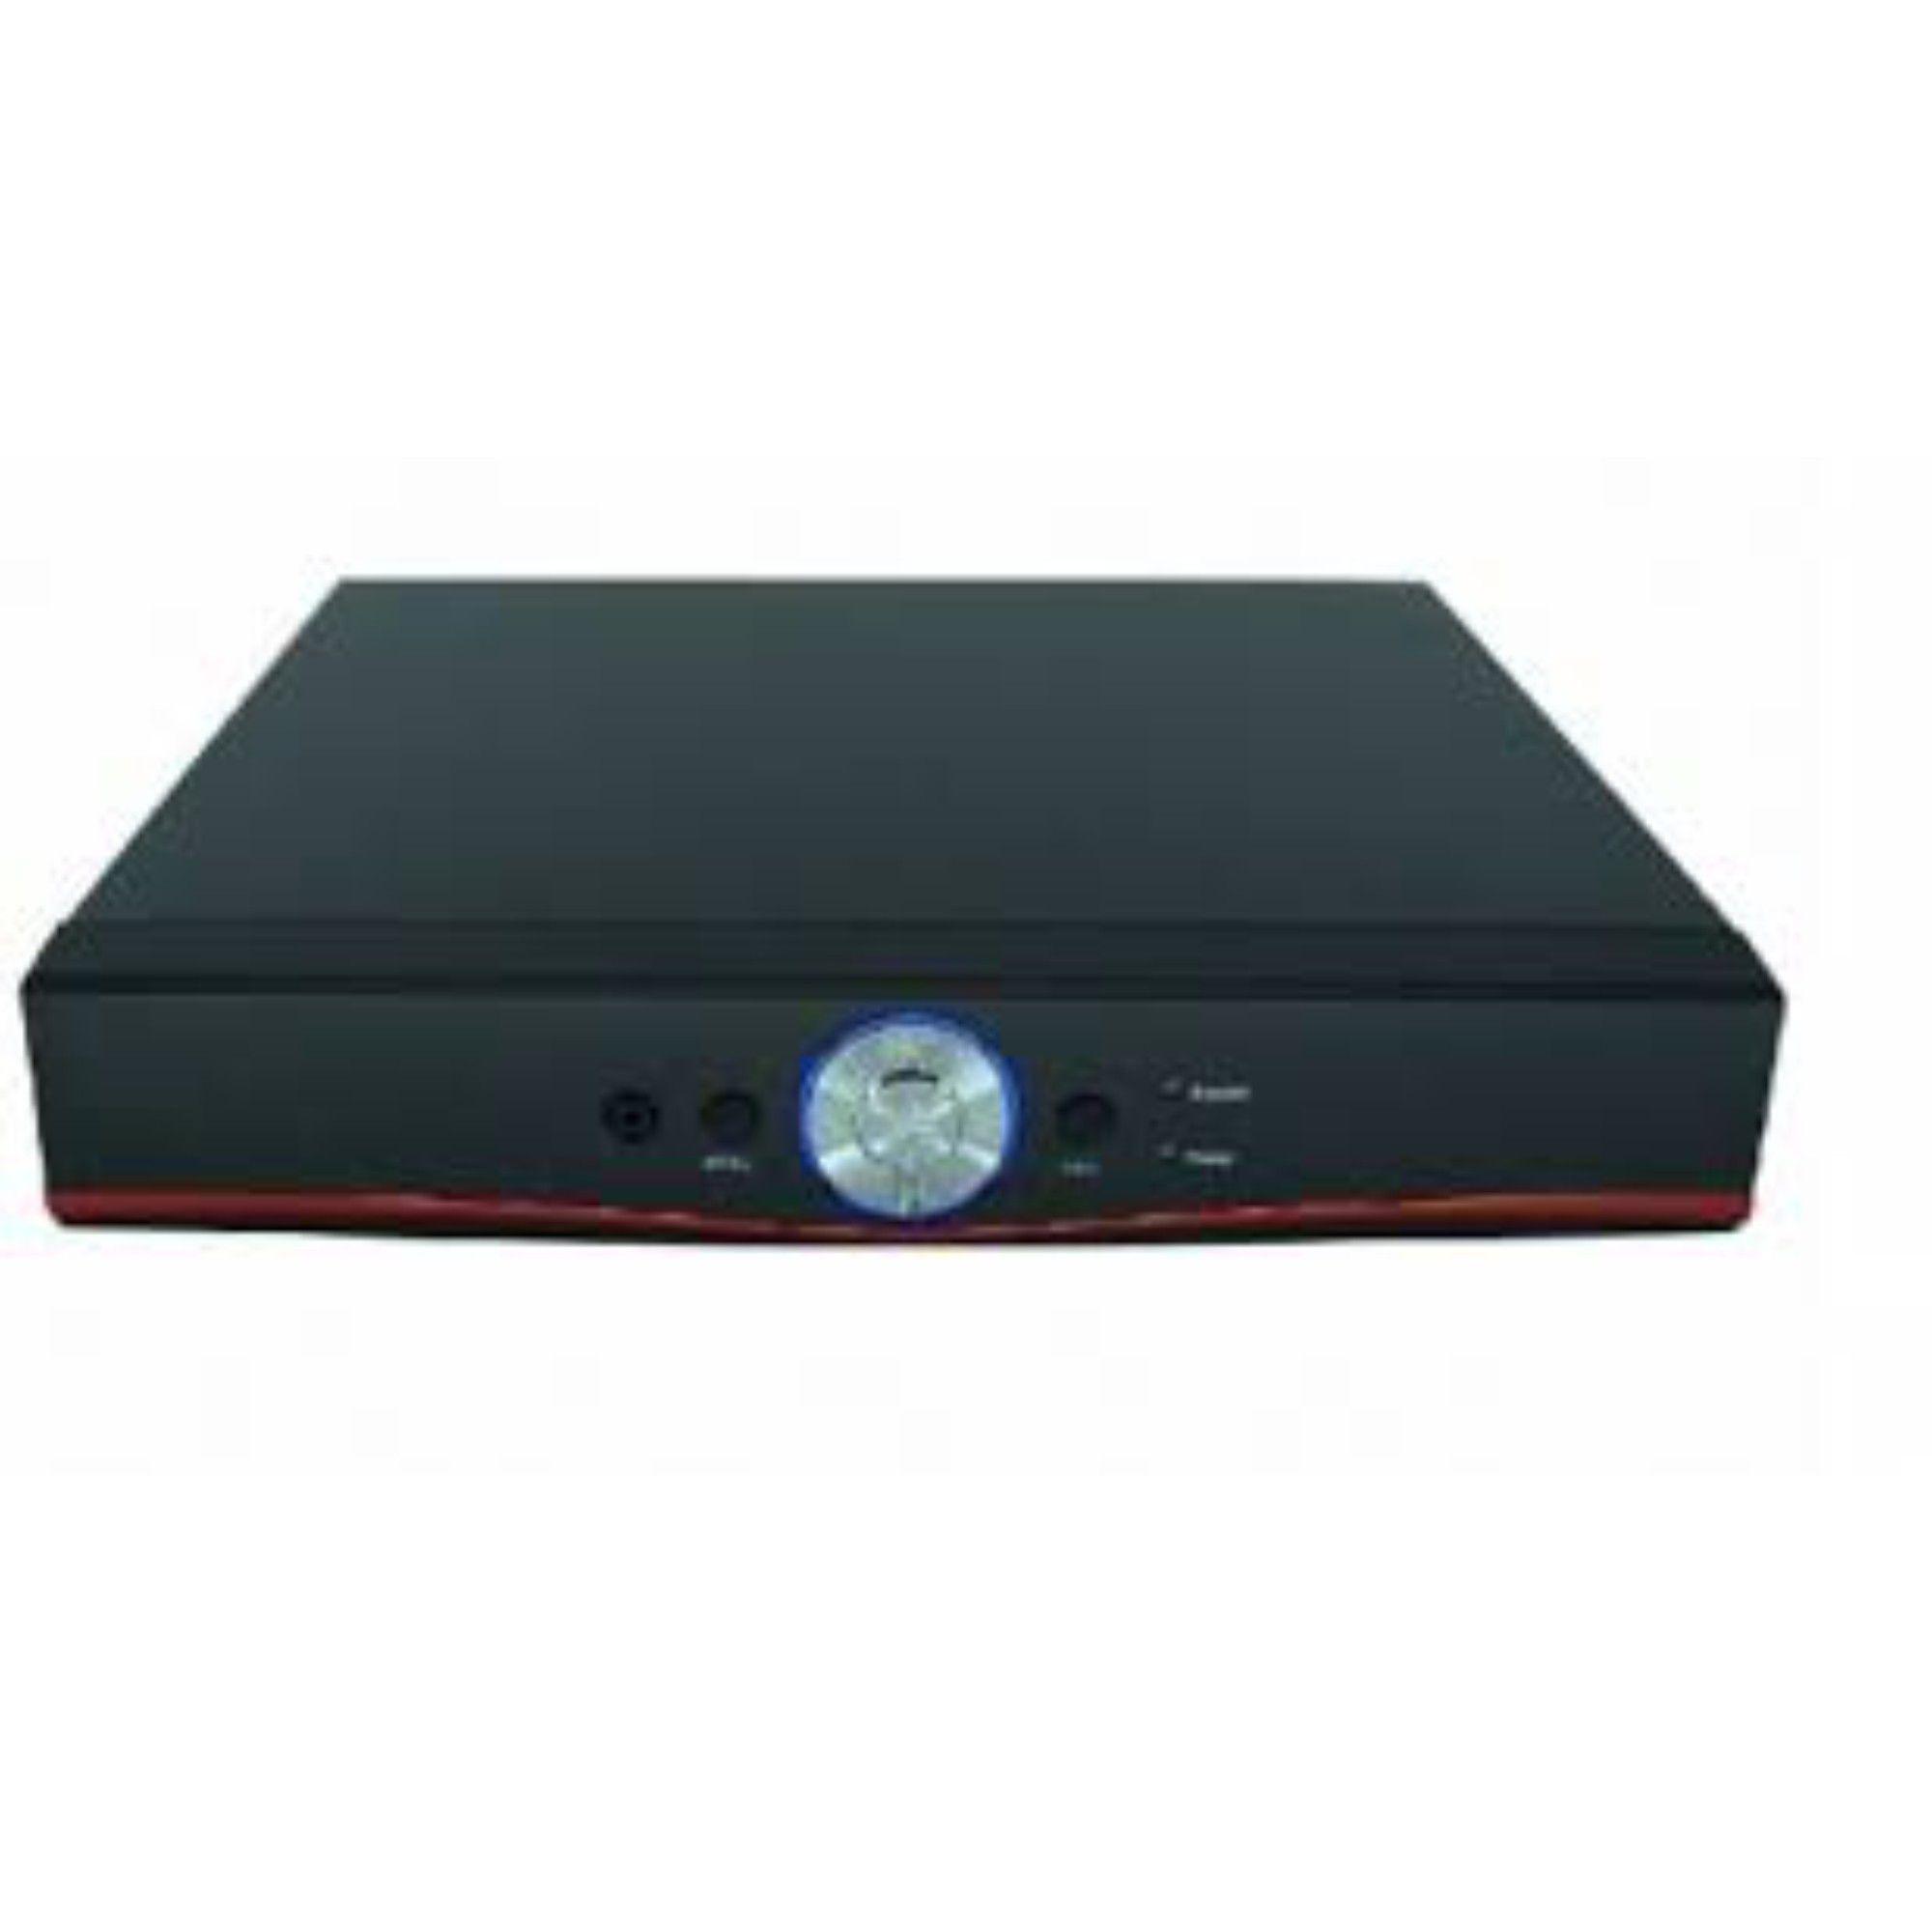 DVR Stand Alone 4 Canais Full HD Jortan 5 em 1